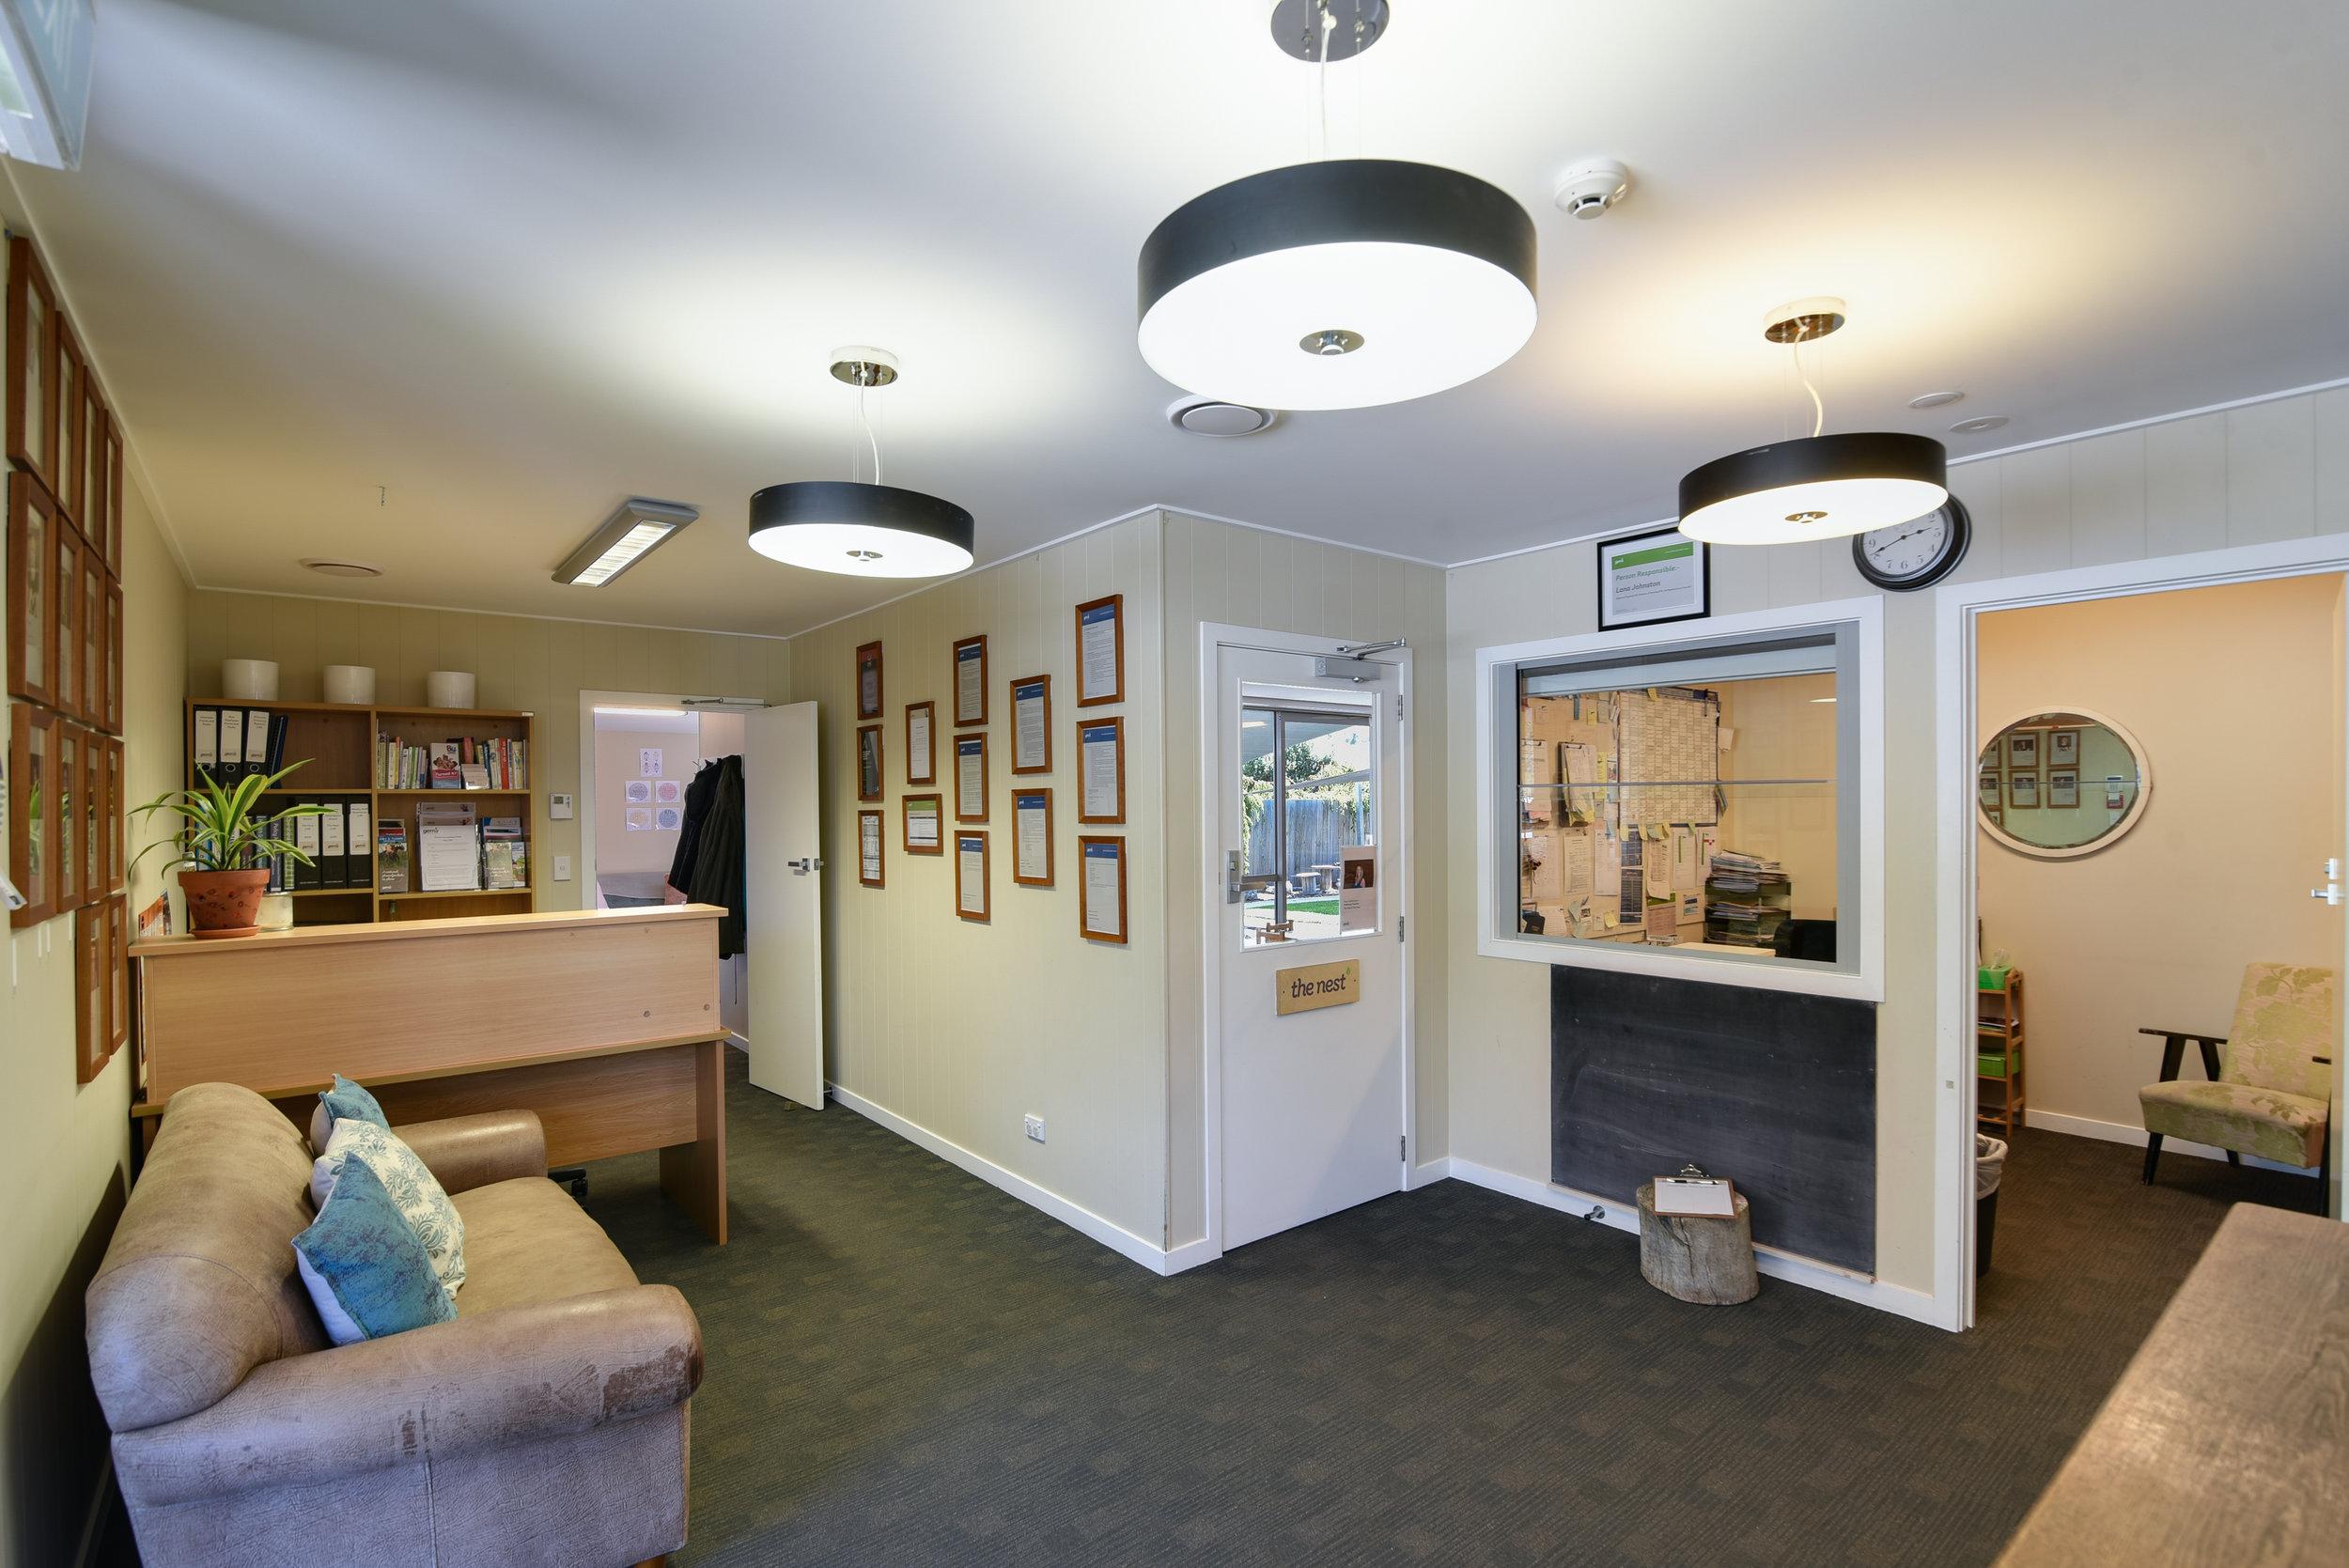 Gems Childcare interiors-5.jpg